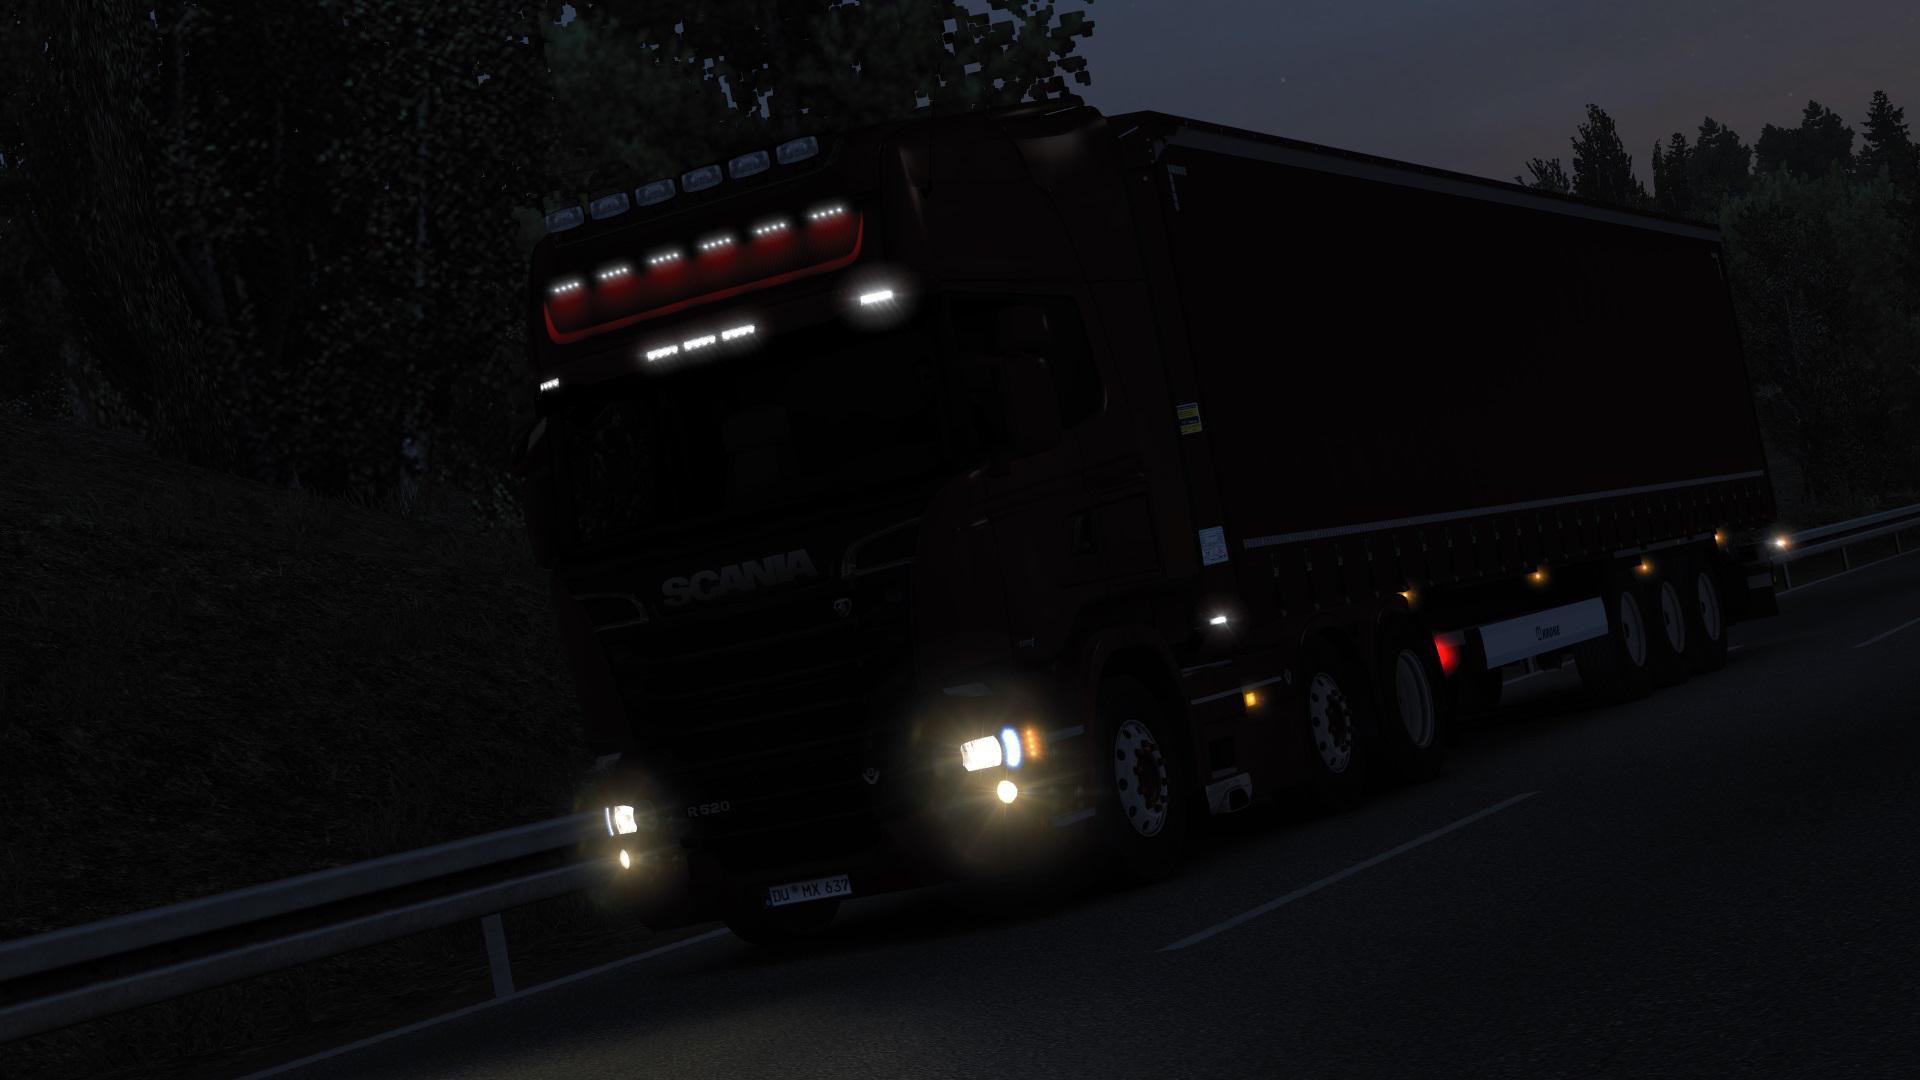 ETS2 - Realistic Headlights V1.0 (1.37.x)